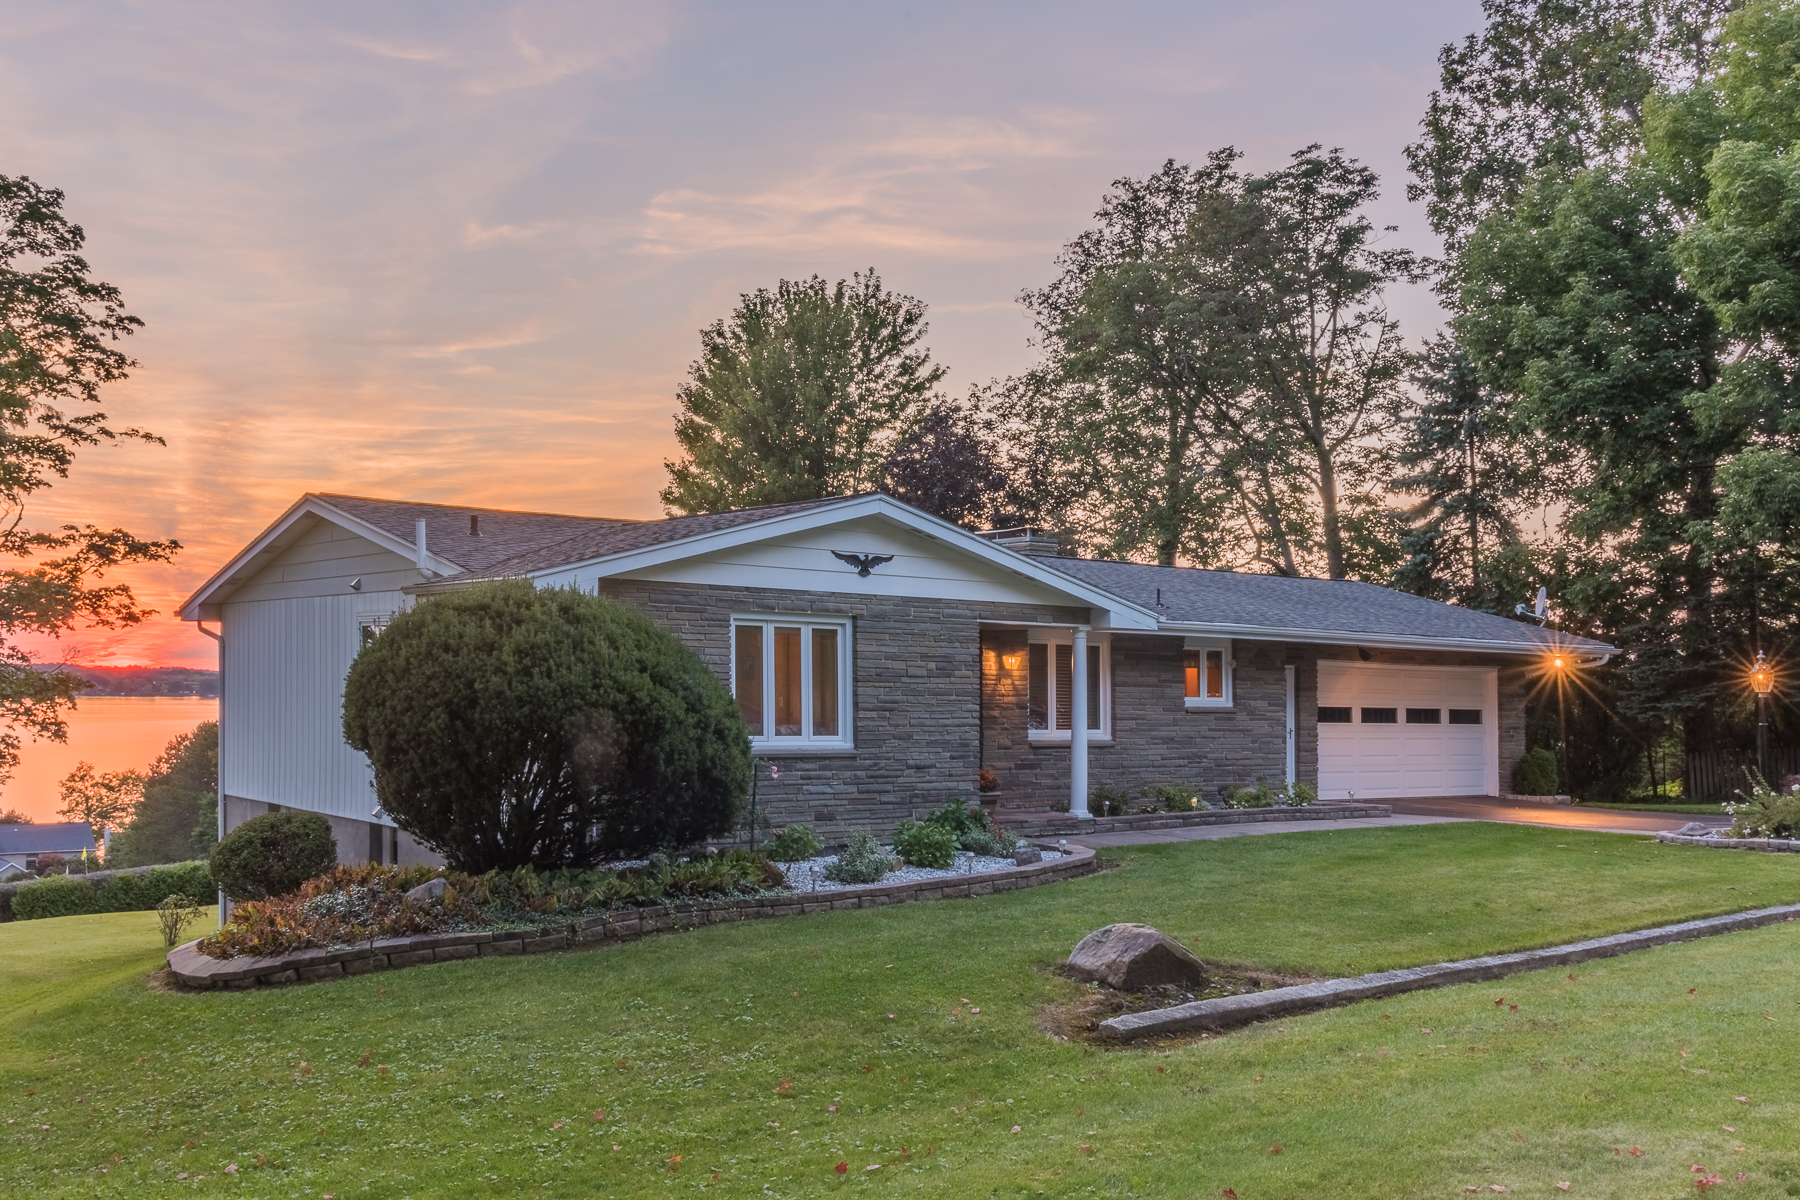 Частный односемейный дом для того Продажа на Updated Ranch with Lake Views 6109 E Lake Rd Owasco, Нью-Йорк 13021 Соединенные Штаты